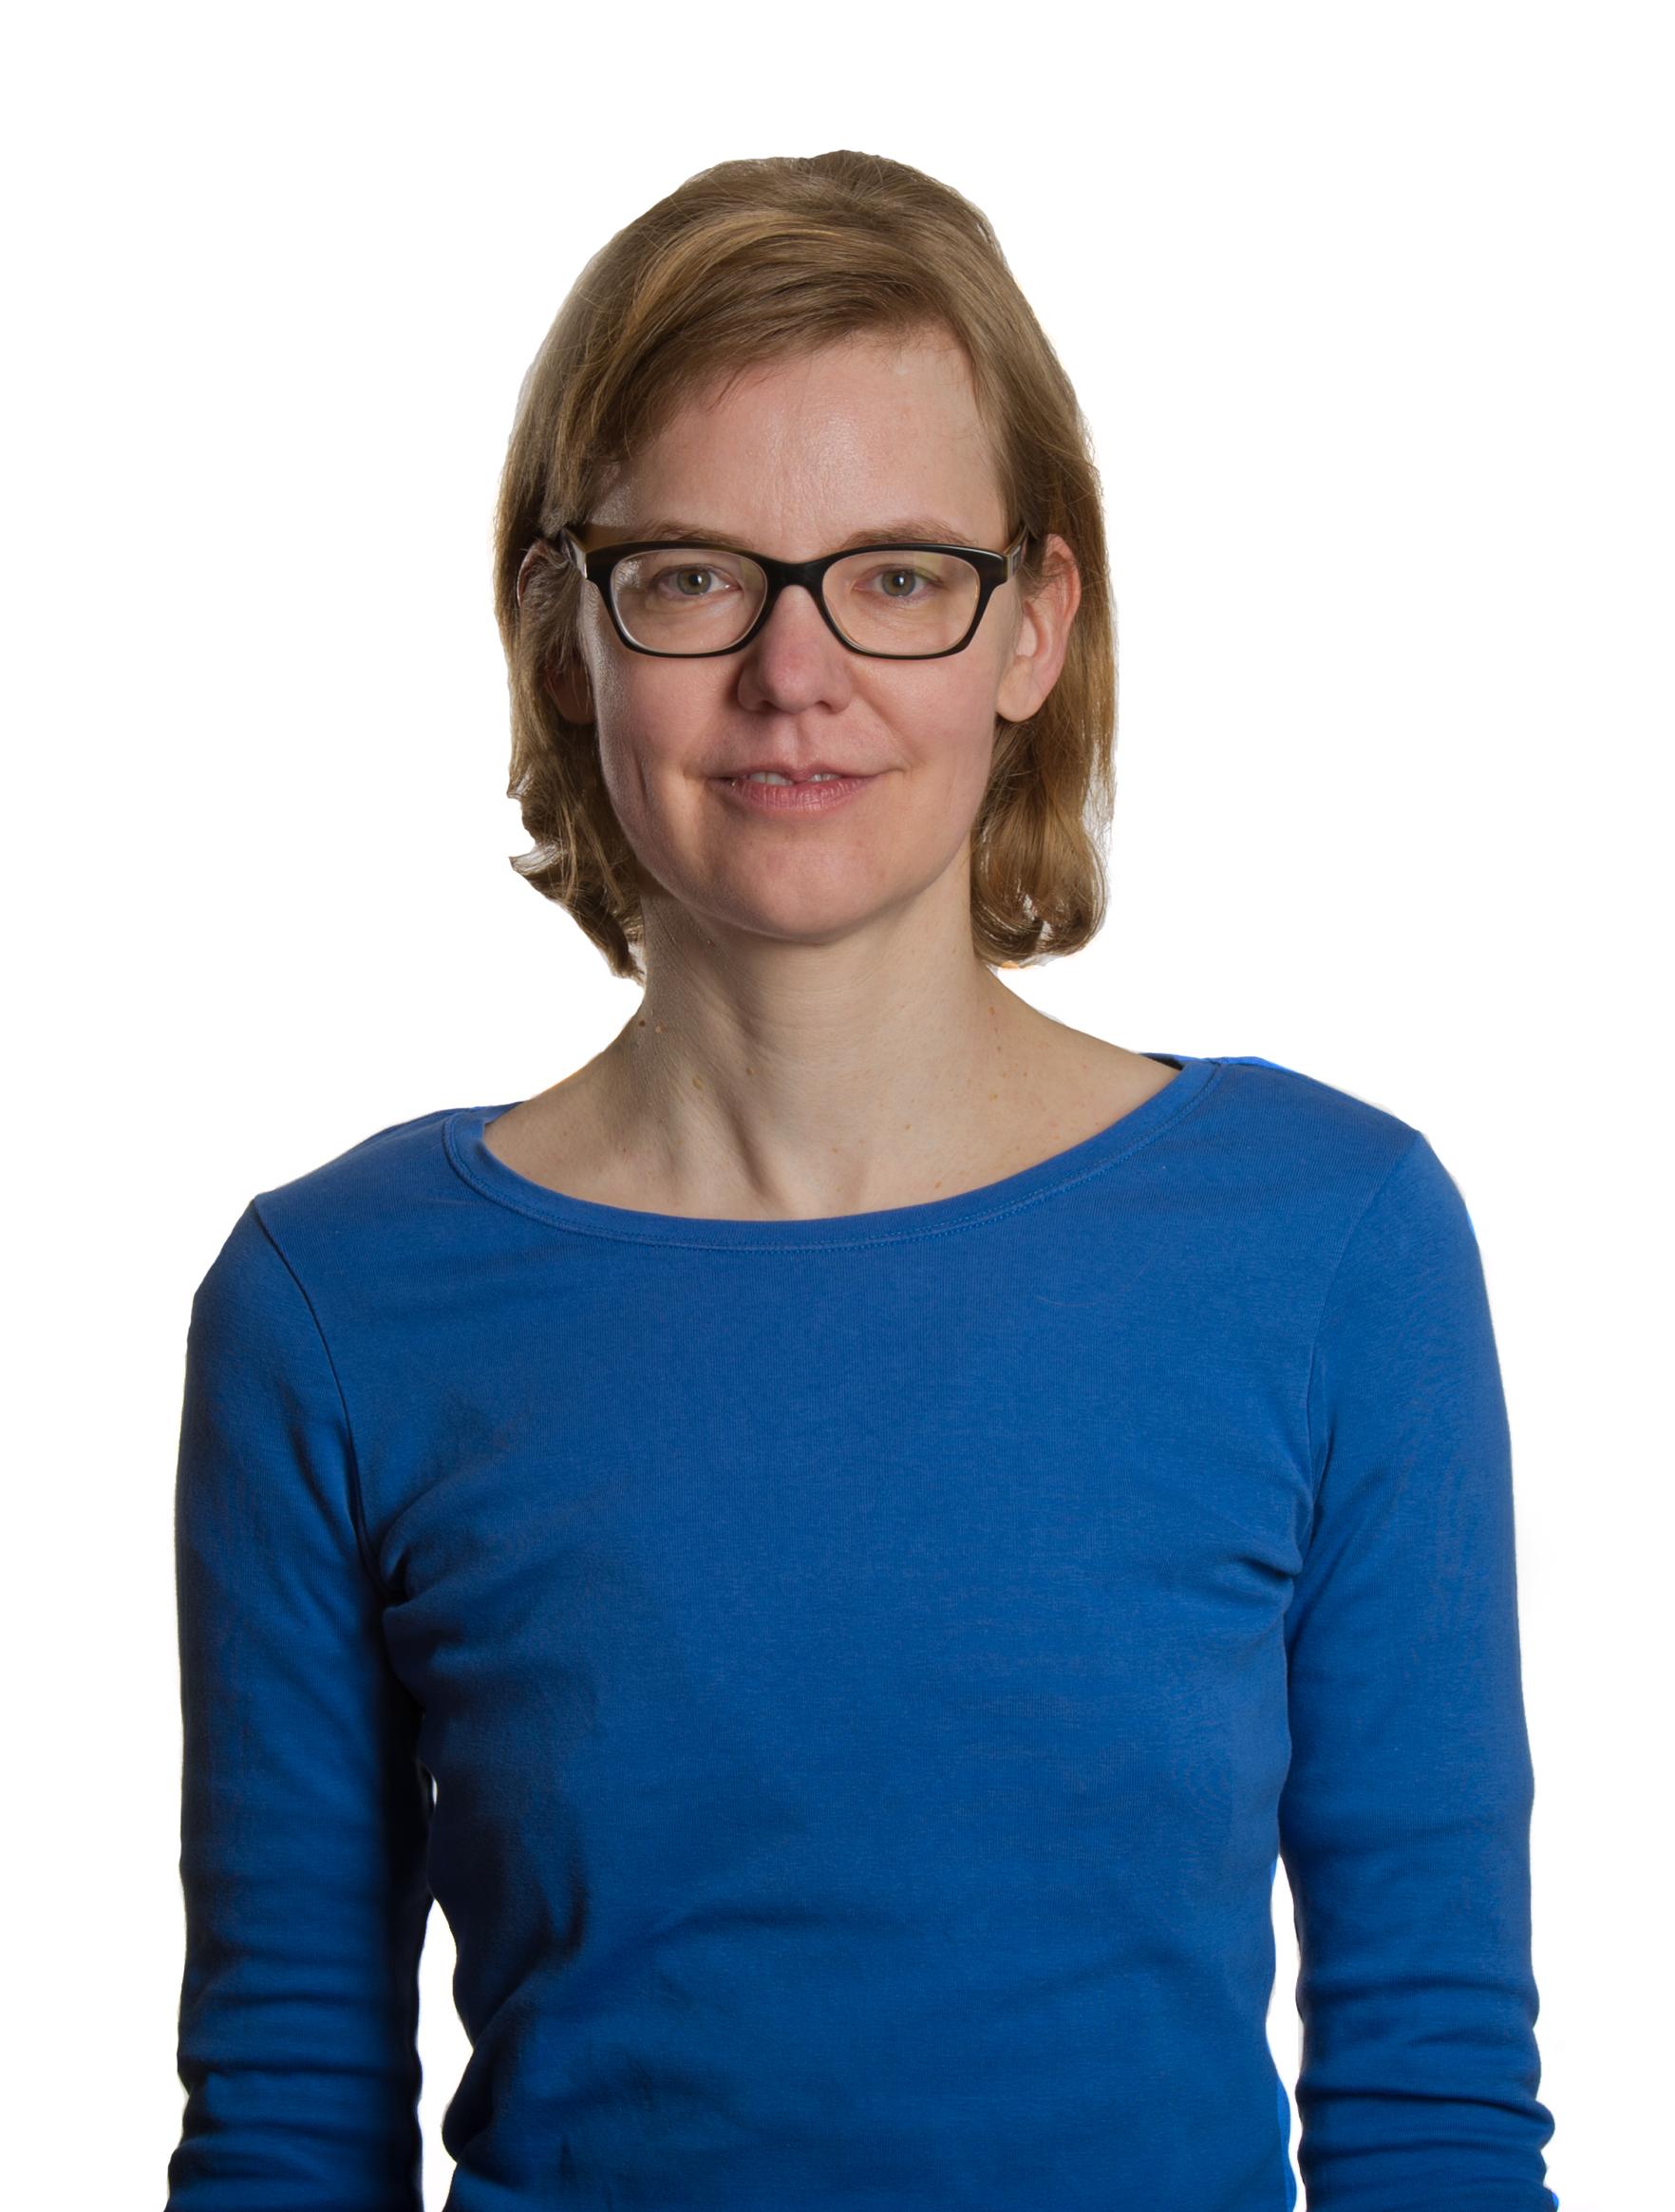 Simone Hess